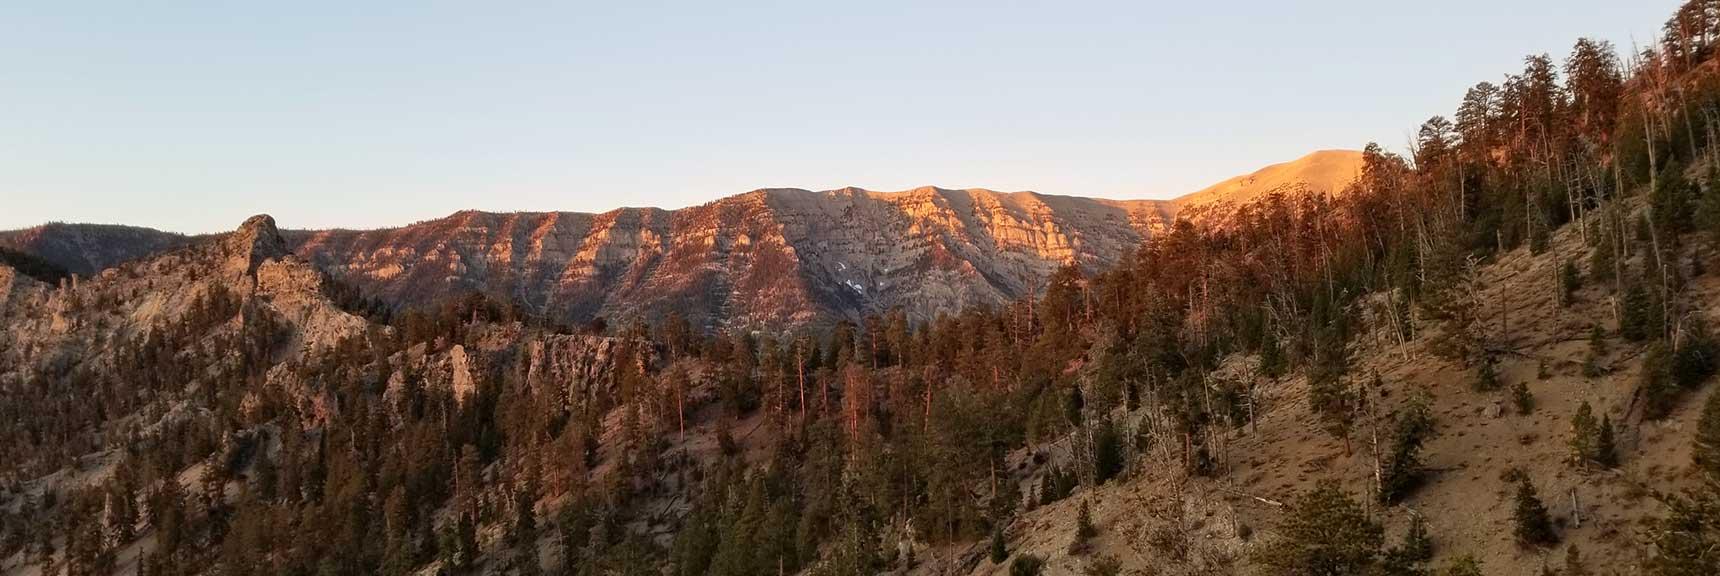 South Ridge of Kyle Canyon from Charleston Peak Toward Griffith Peak, Six Peak Circuit Adventure Strategy, Spring Mountains, Nevada